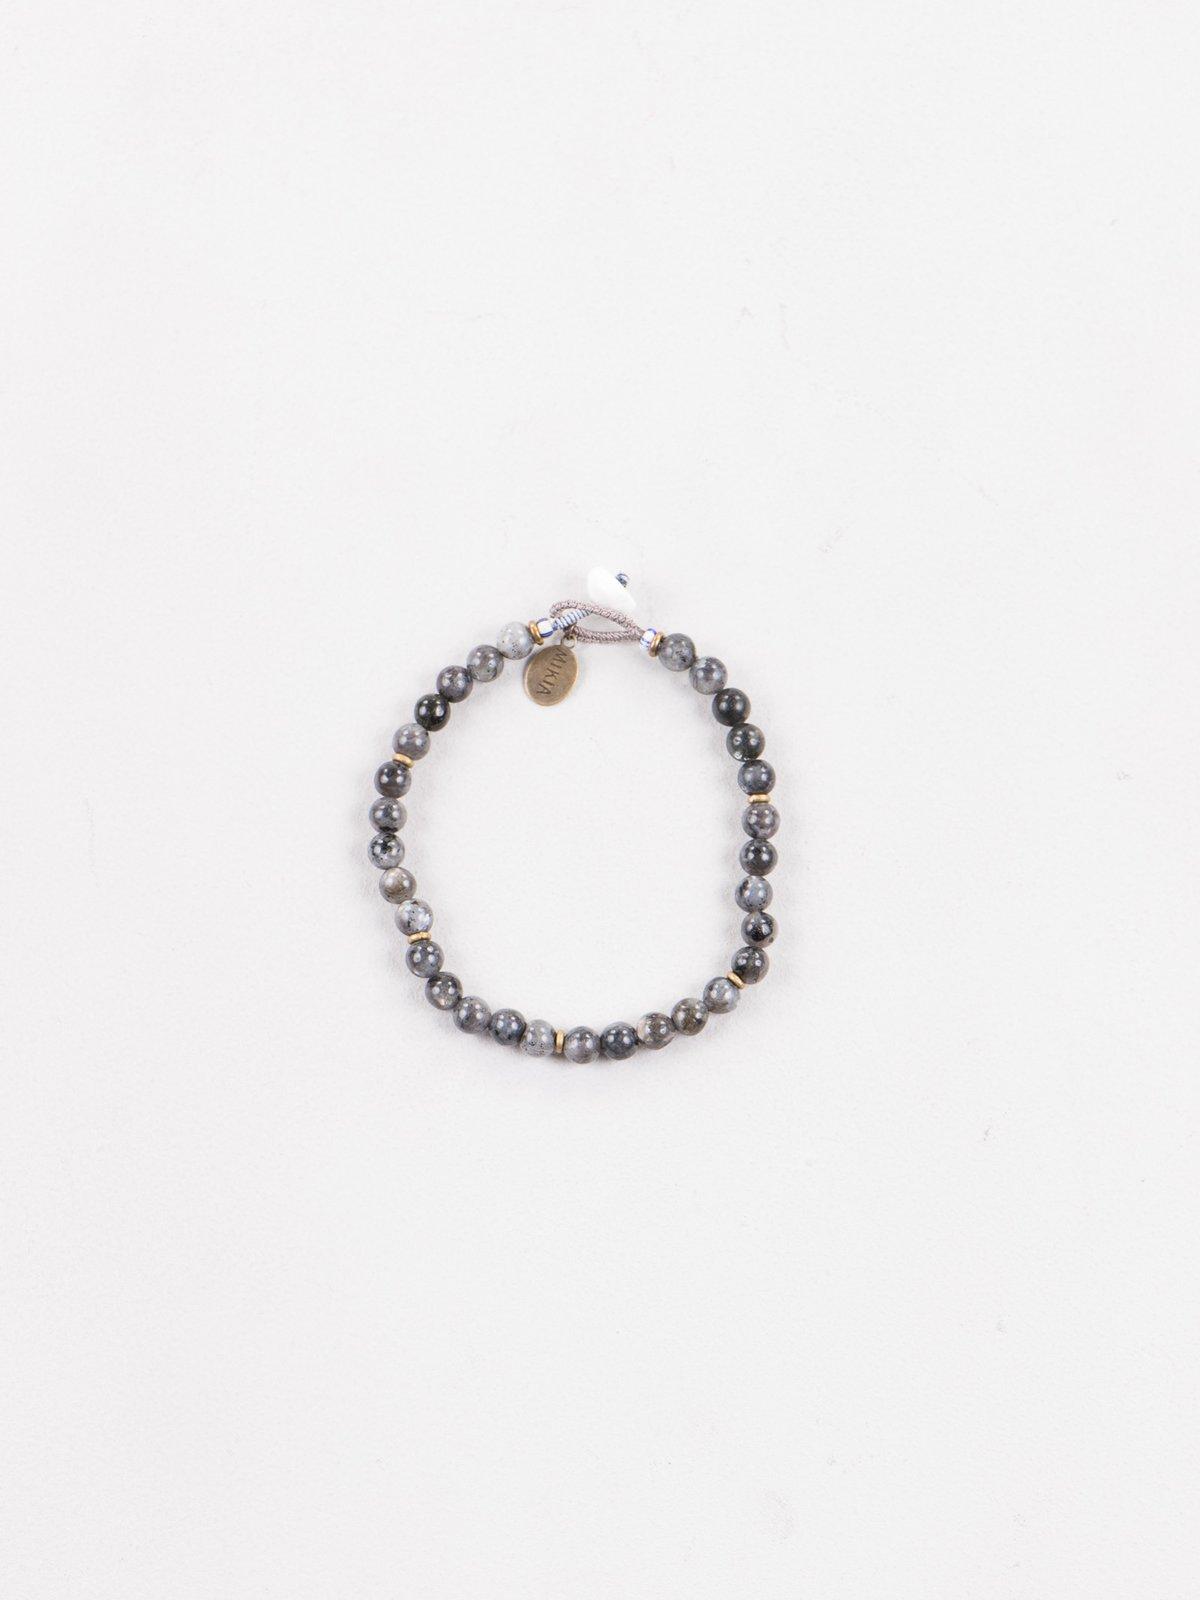 Larvikite 6mm Bracelet - Image 1